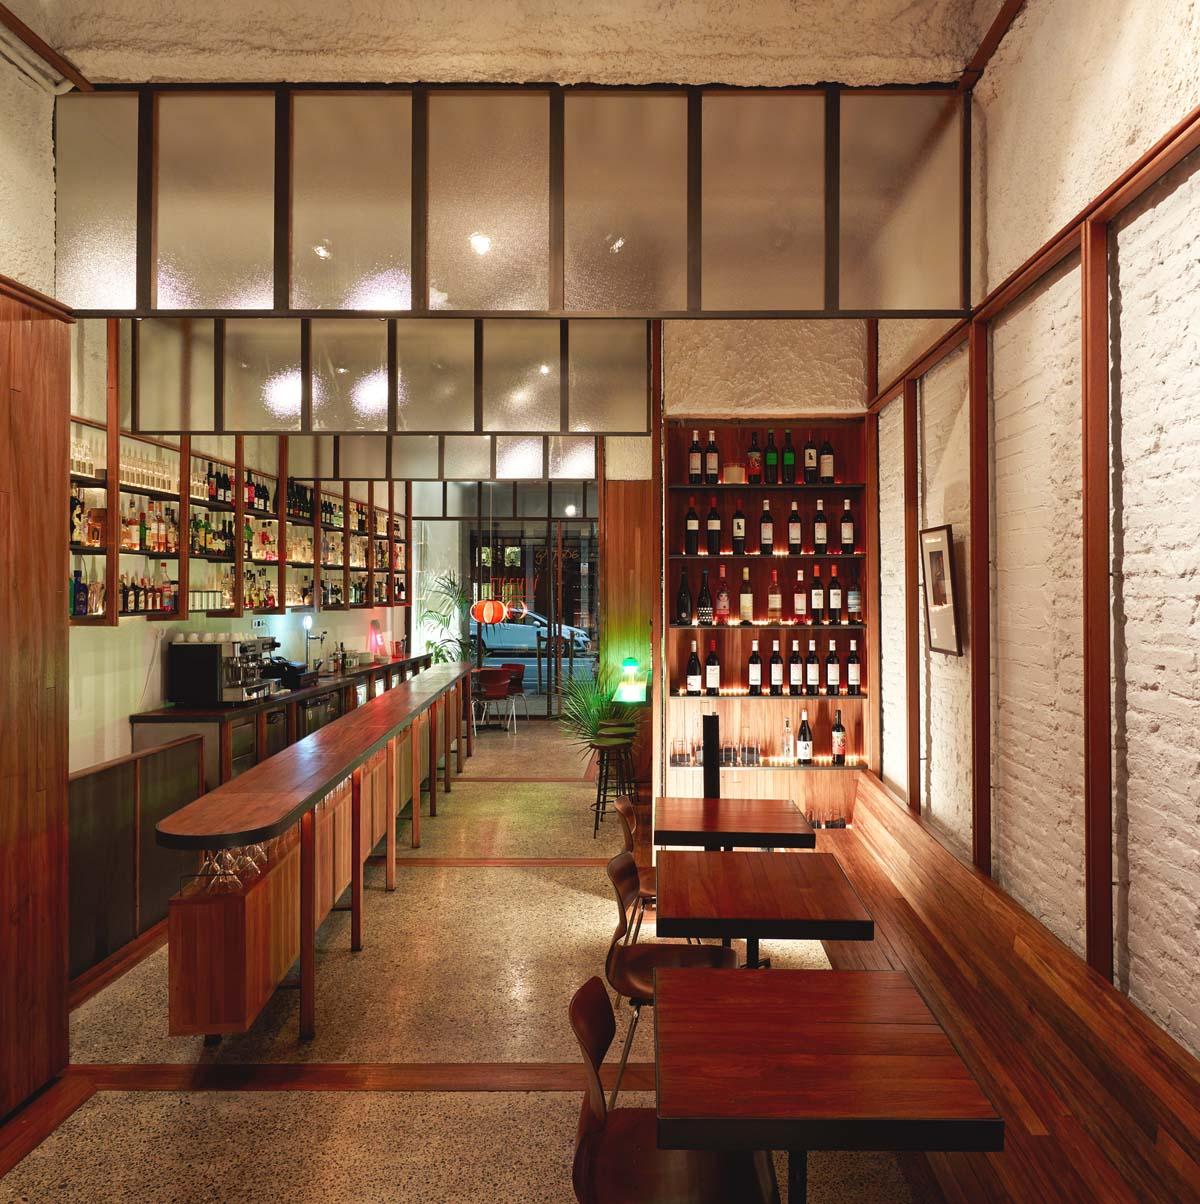 Marcos catal n y anna badia restaurante vivant barcelona hic arquitectura - Marcos catalan ...